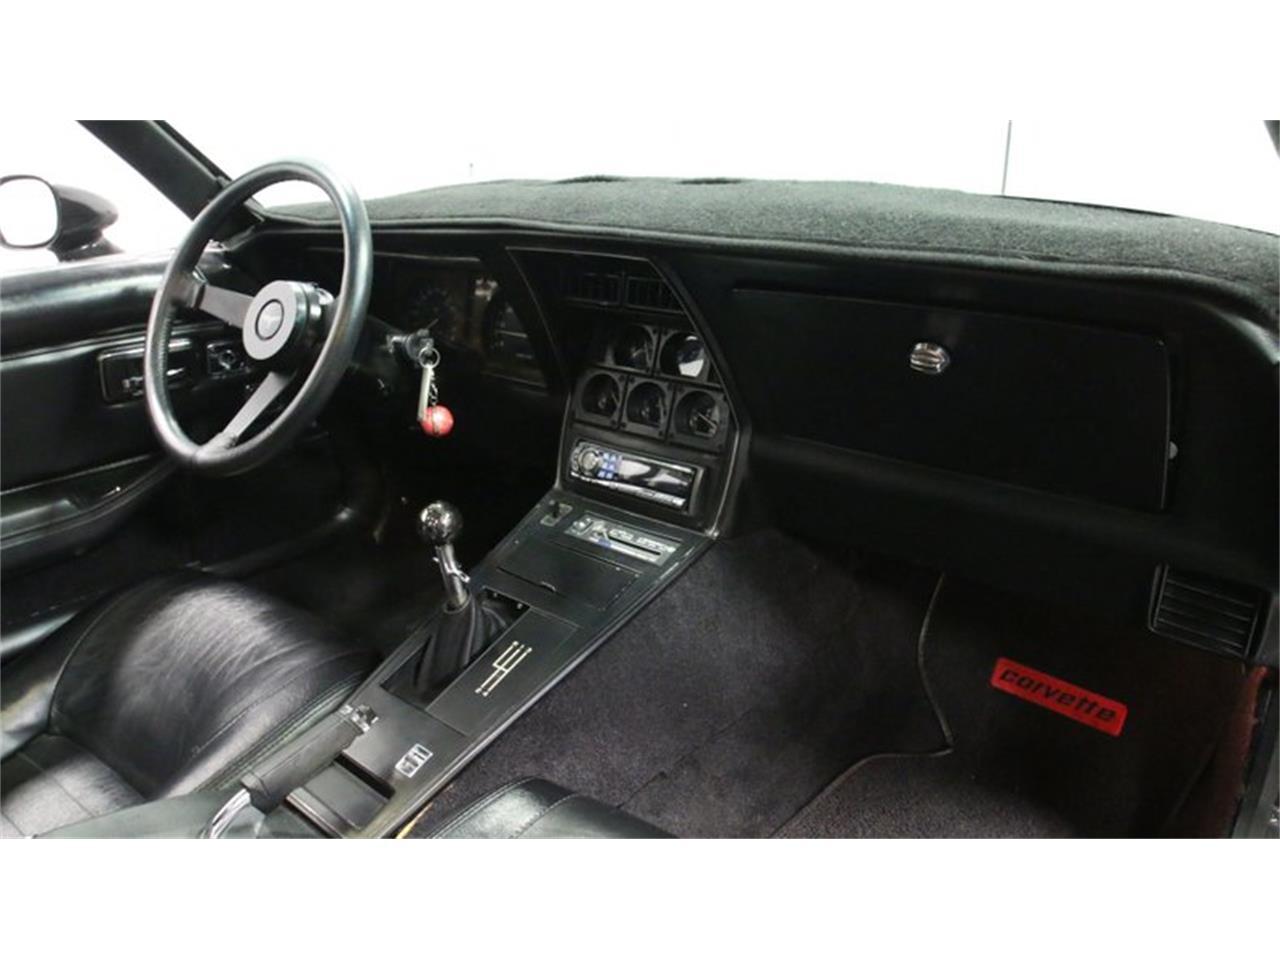 1981 Chevrolet Corvette (CC-1266649) for sale in Lithia Springs, Georgia